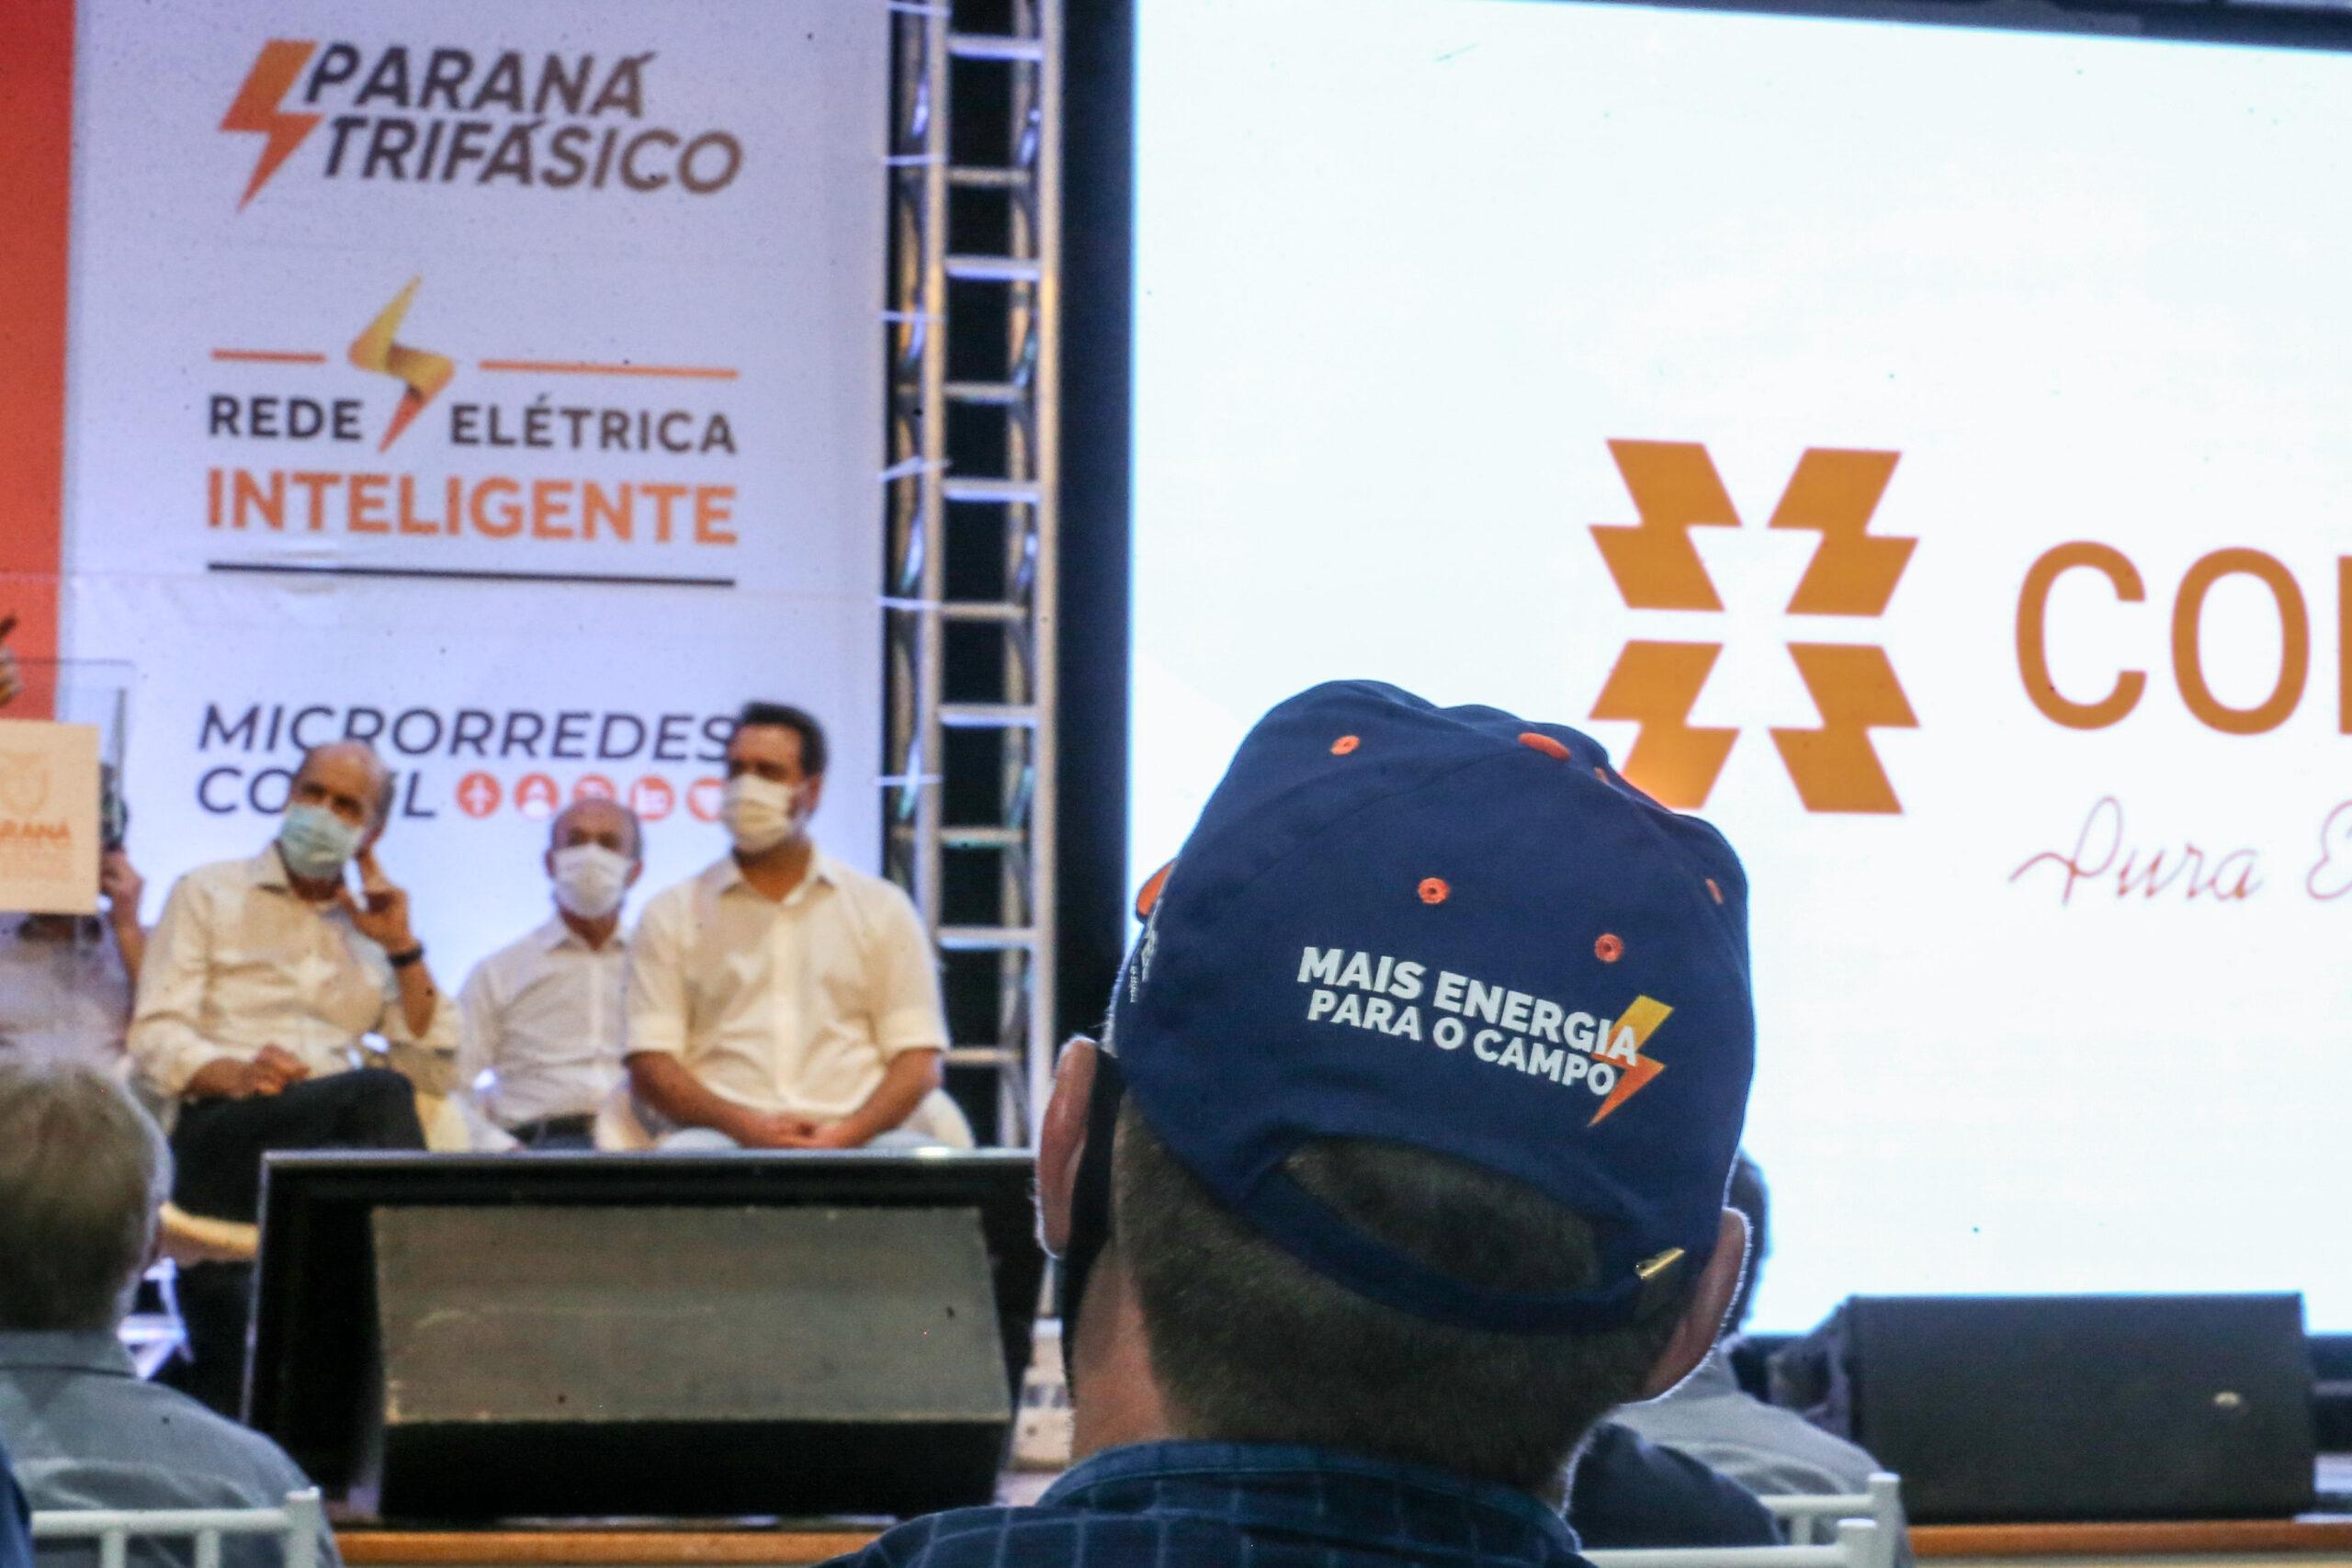 Paraná Trifásico atinge marca de 2,5 mil quilômetros